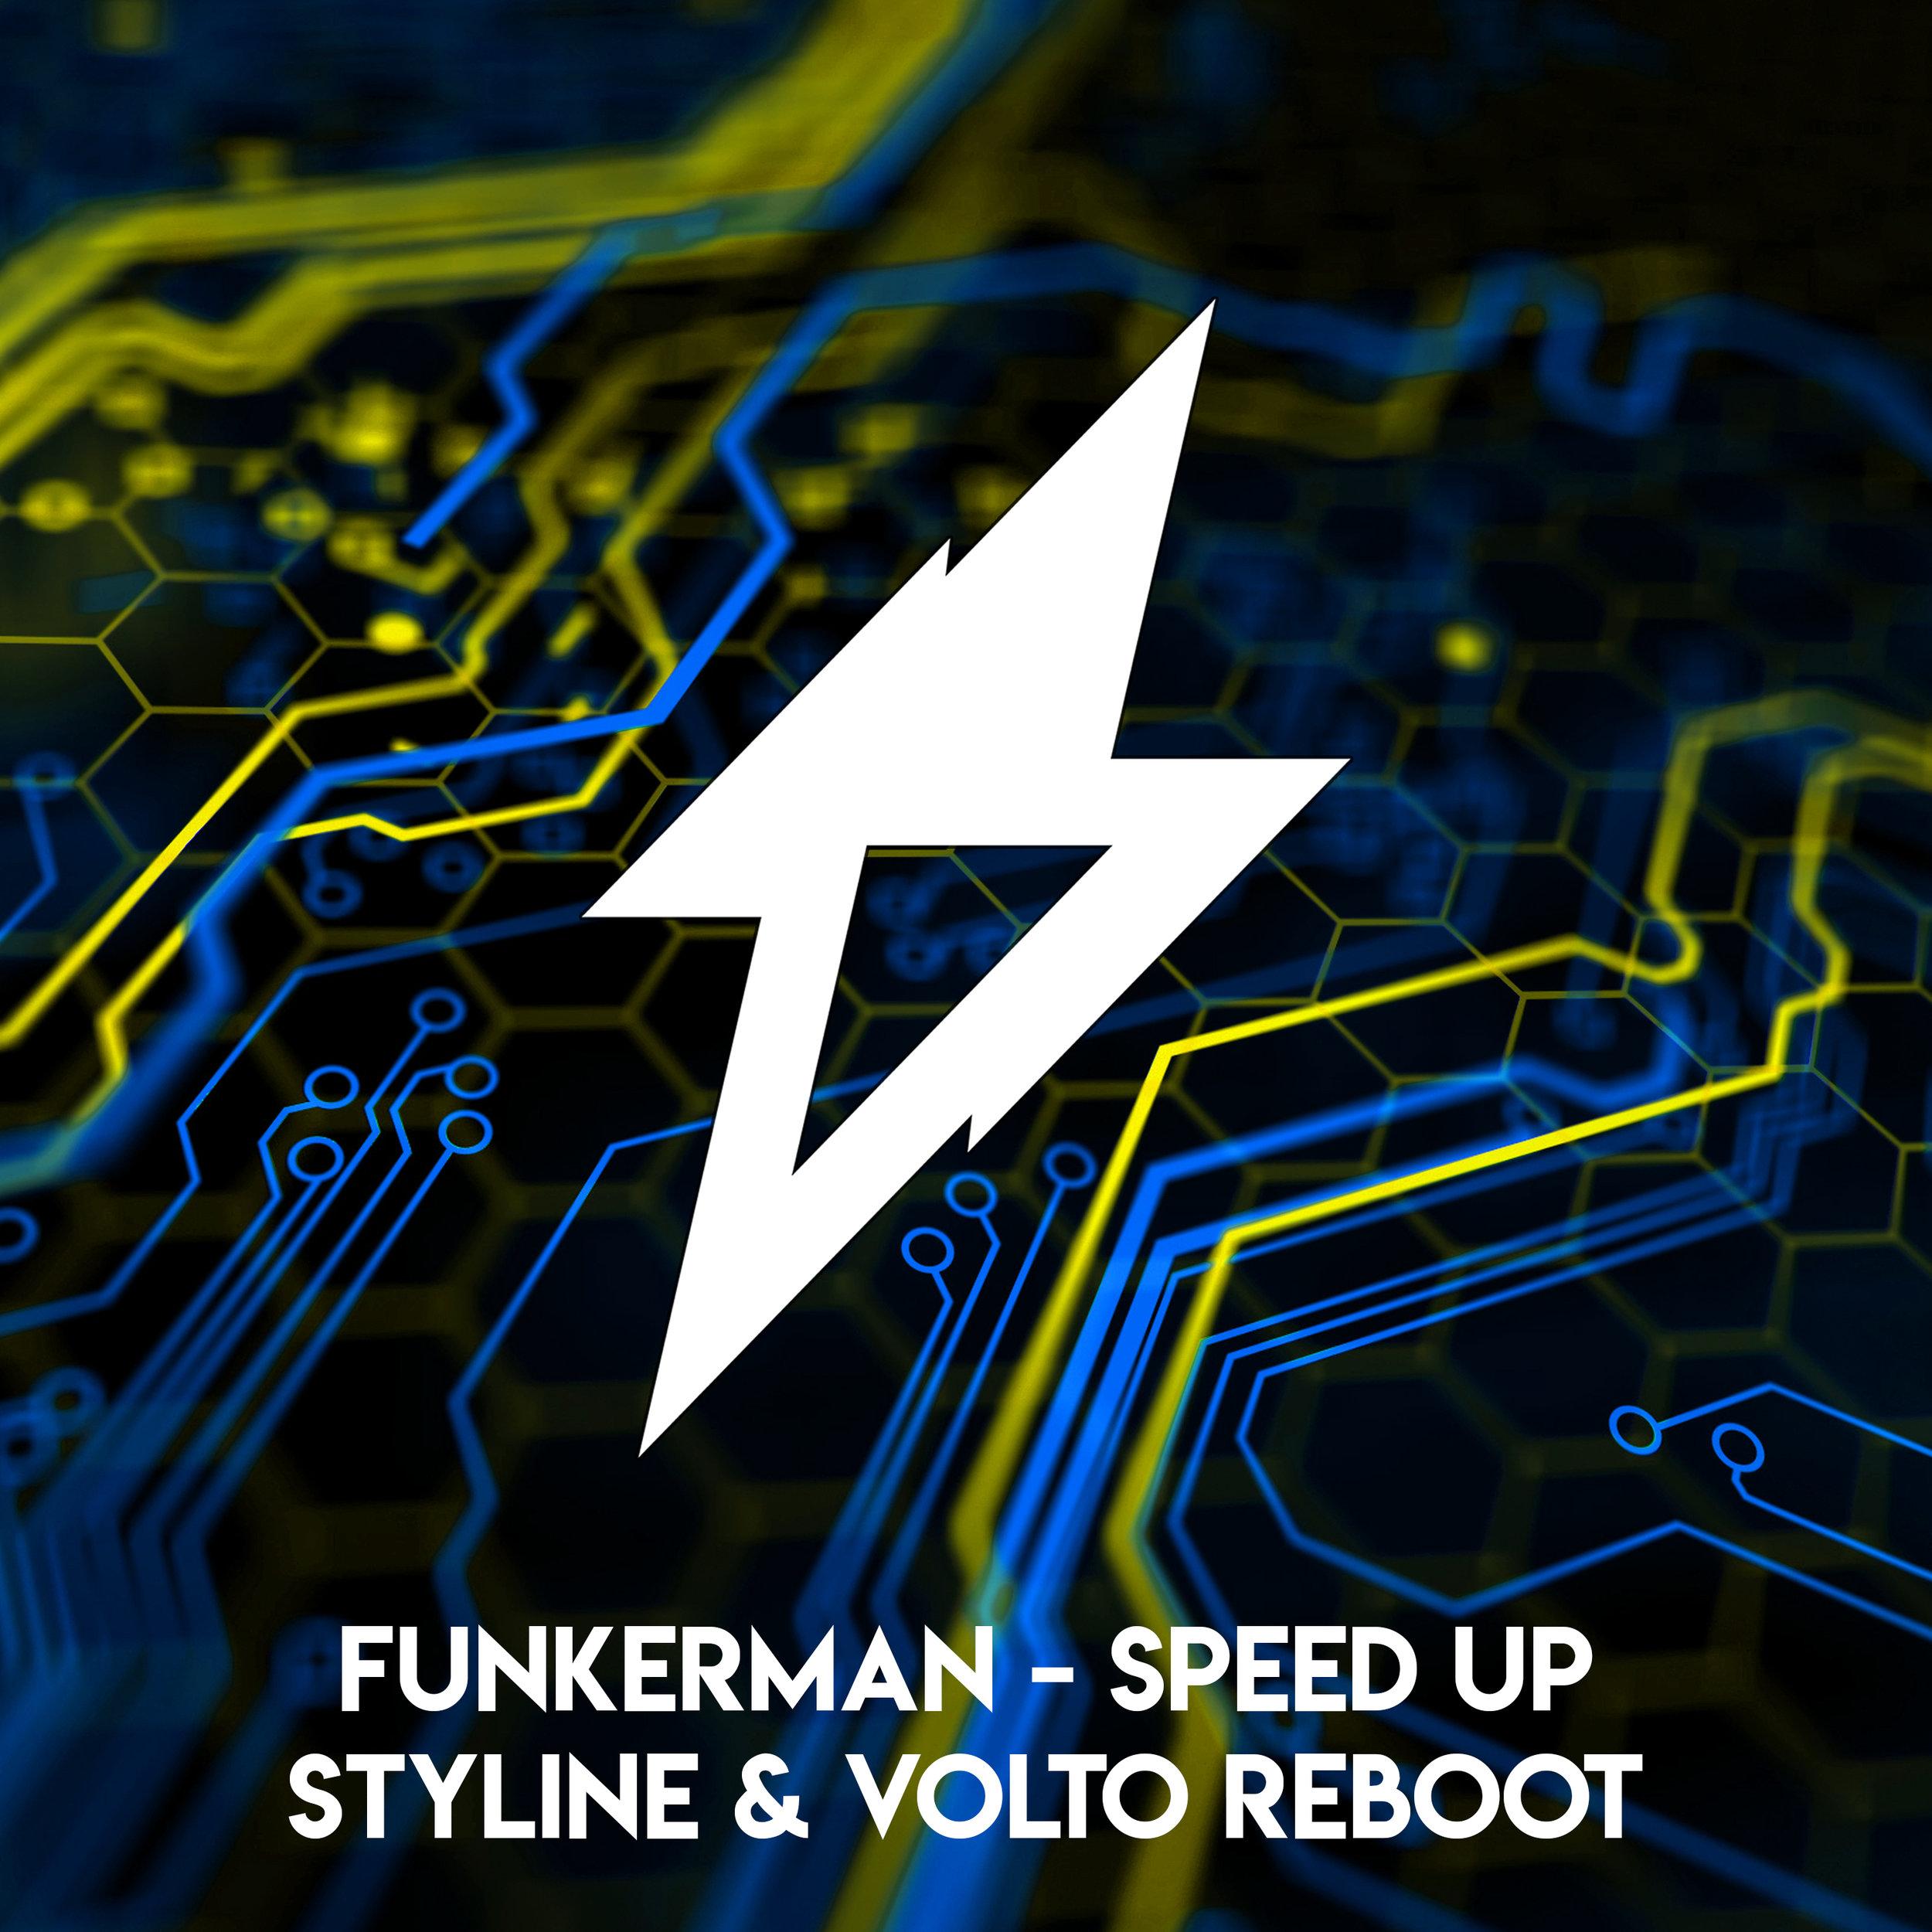 Funkerman - Speed Up (Styline & VOLTO Remix)